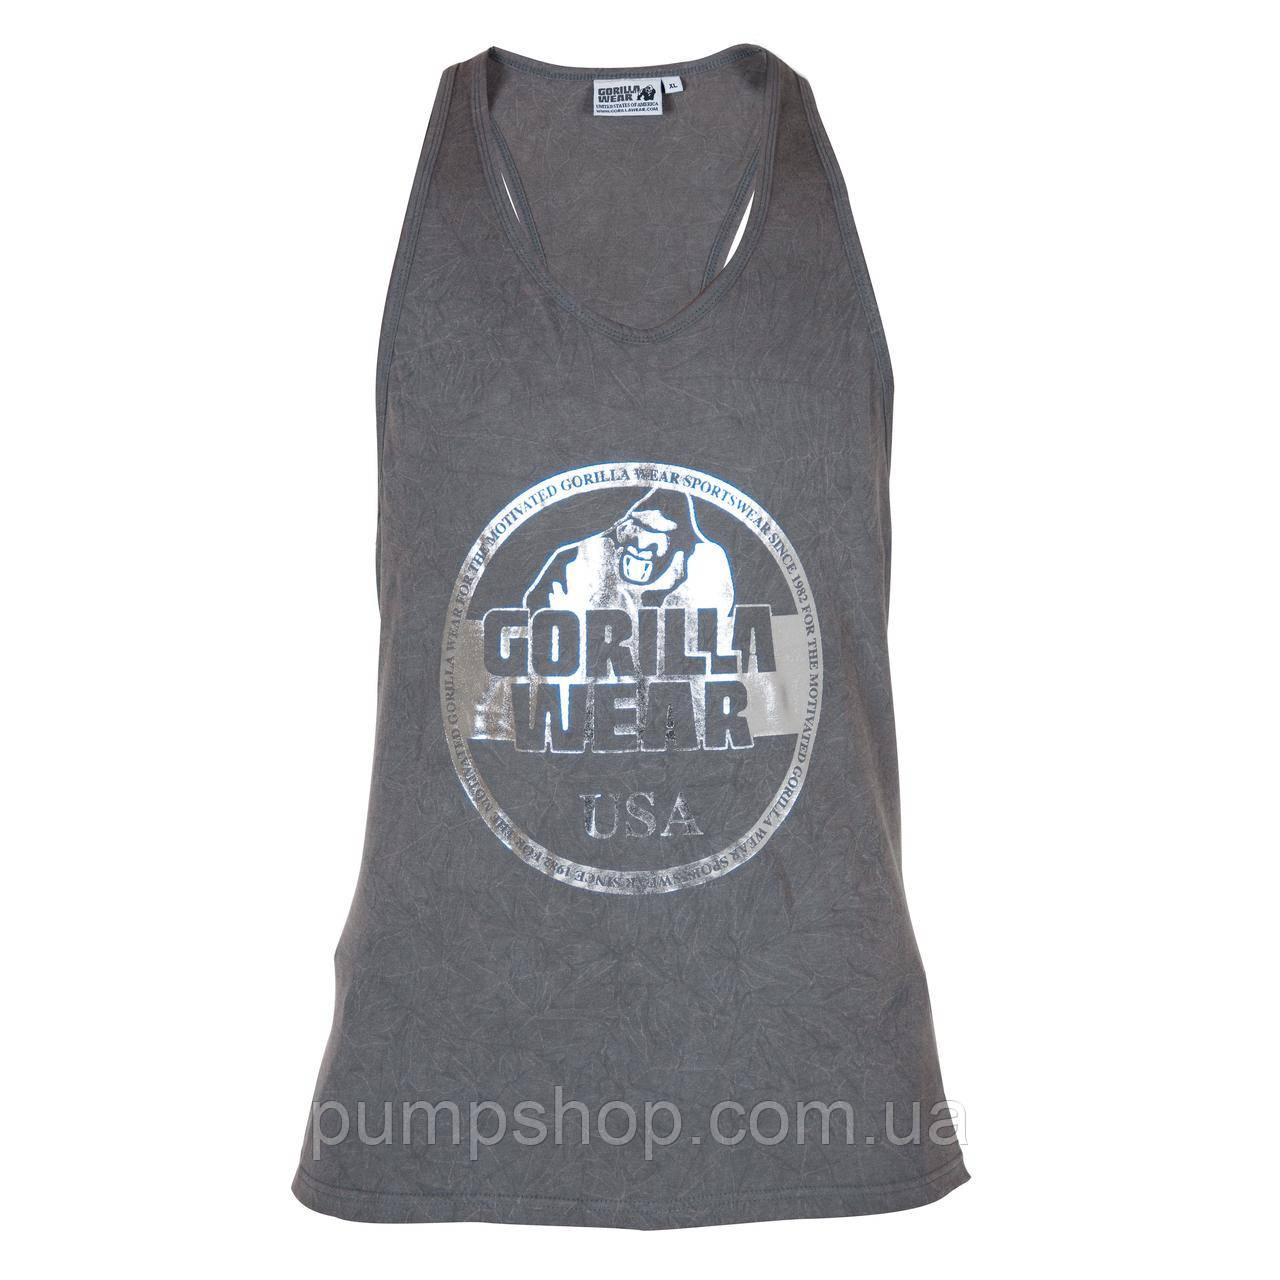 Спортивная майка Gorilla Wear Mill Valley Tank Top XXL серая